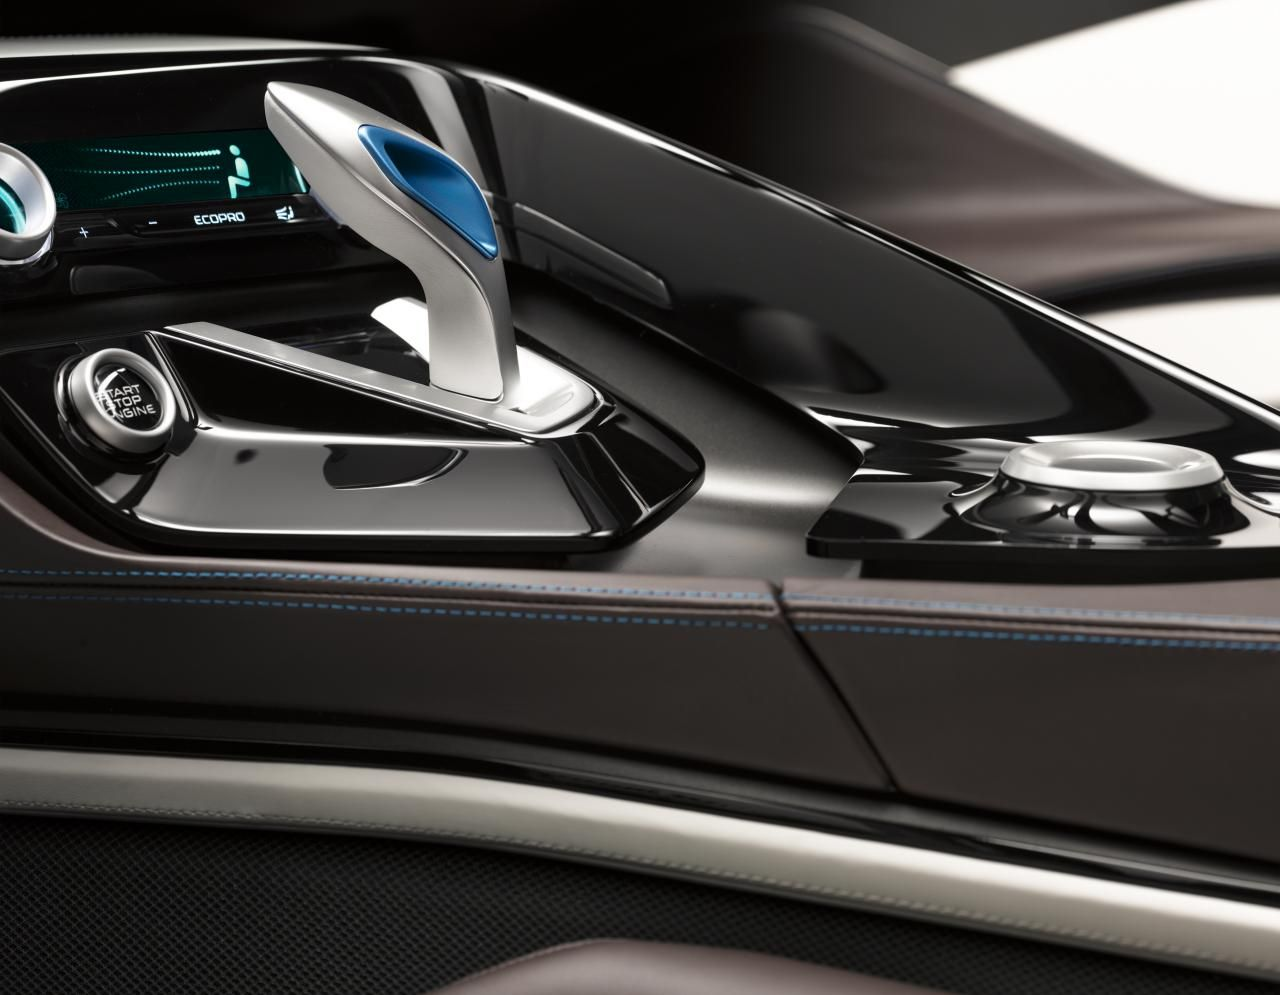 2011 BMW i8 Concept – Галерея | Transport design | Pinterest | Bmw ...